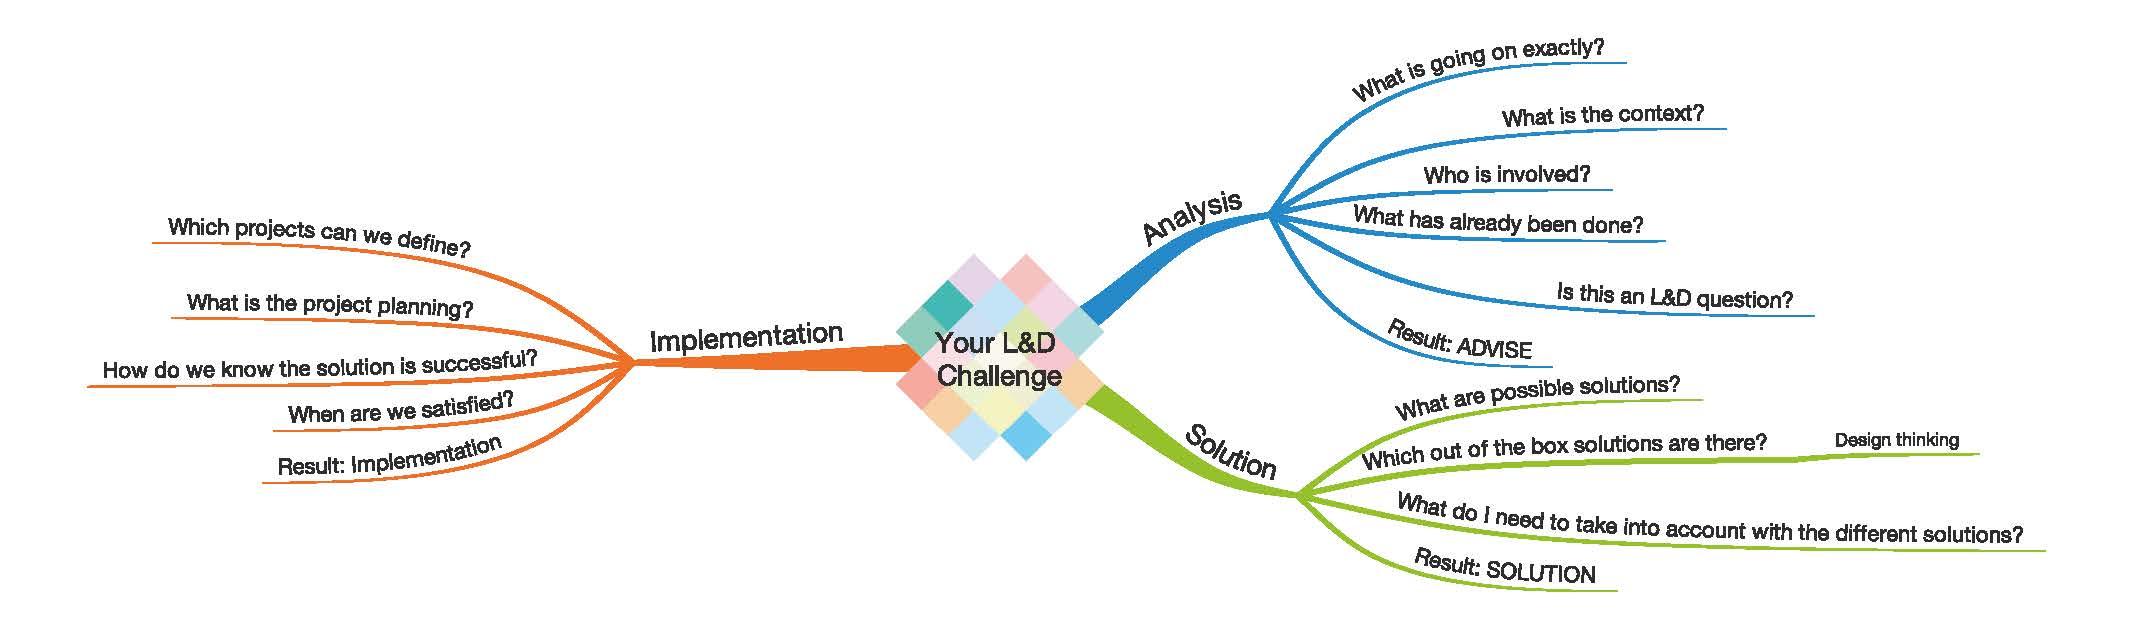 Your LD challenge